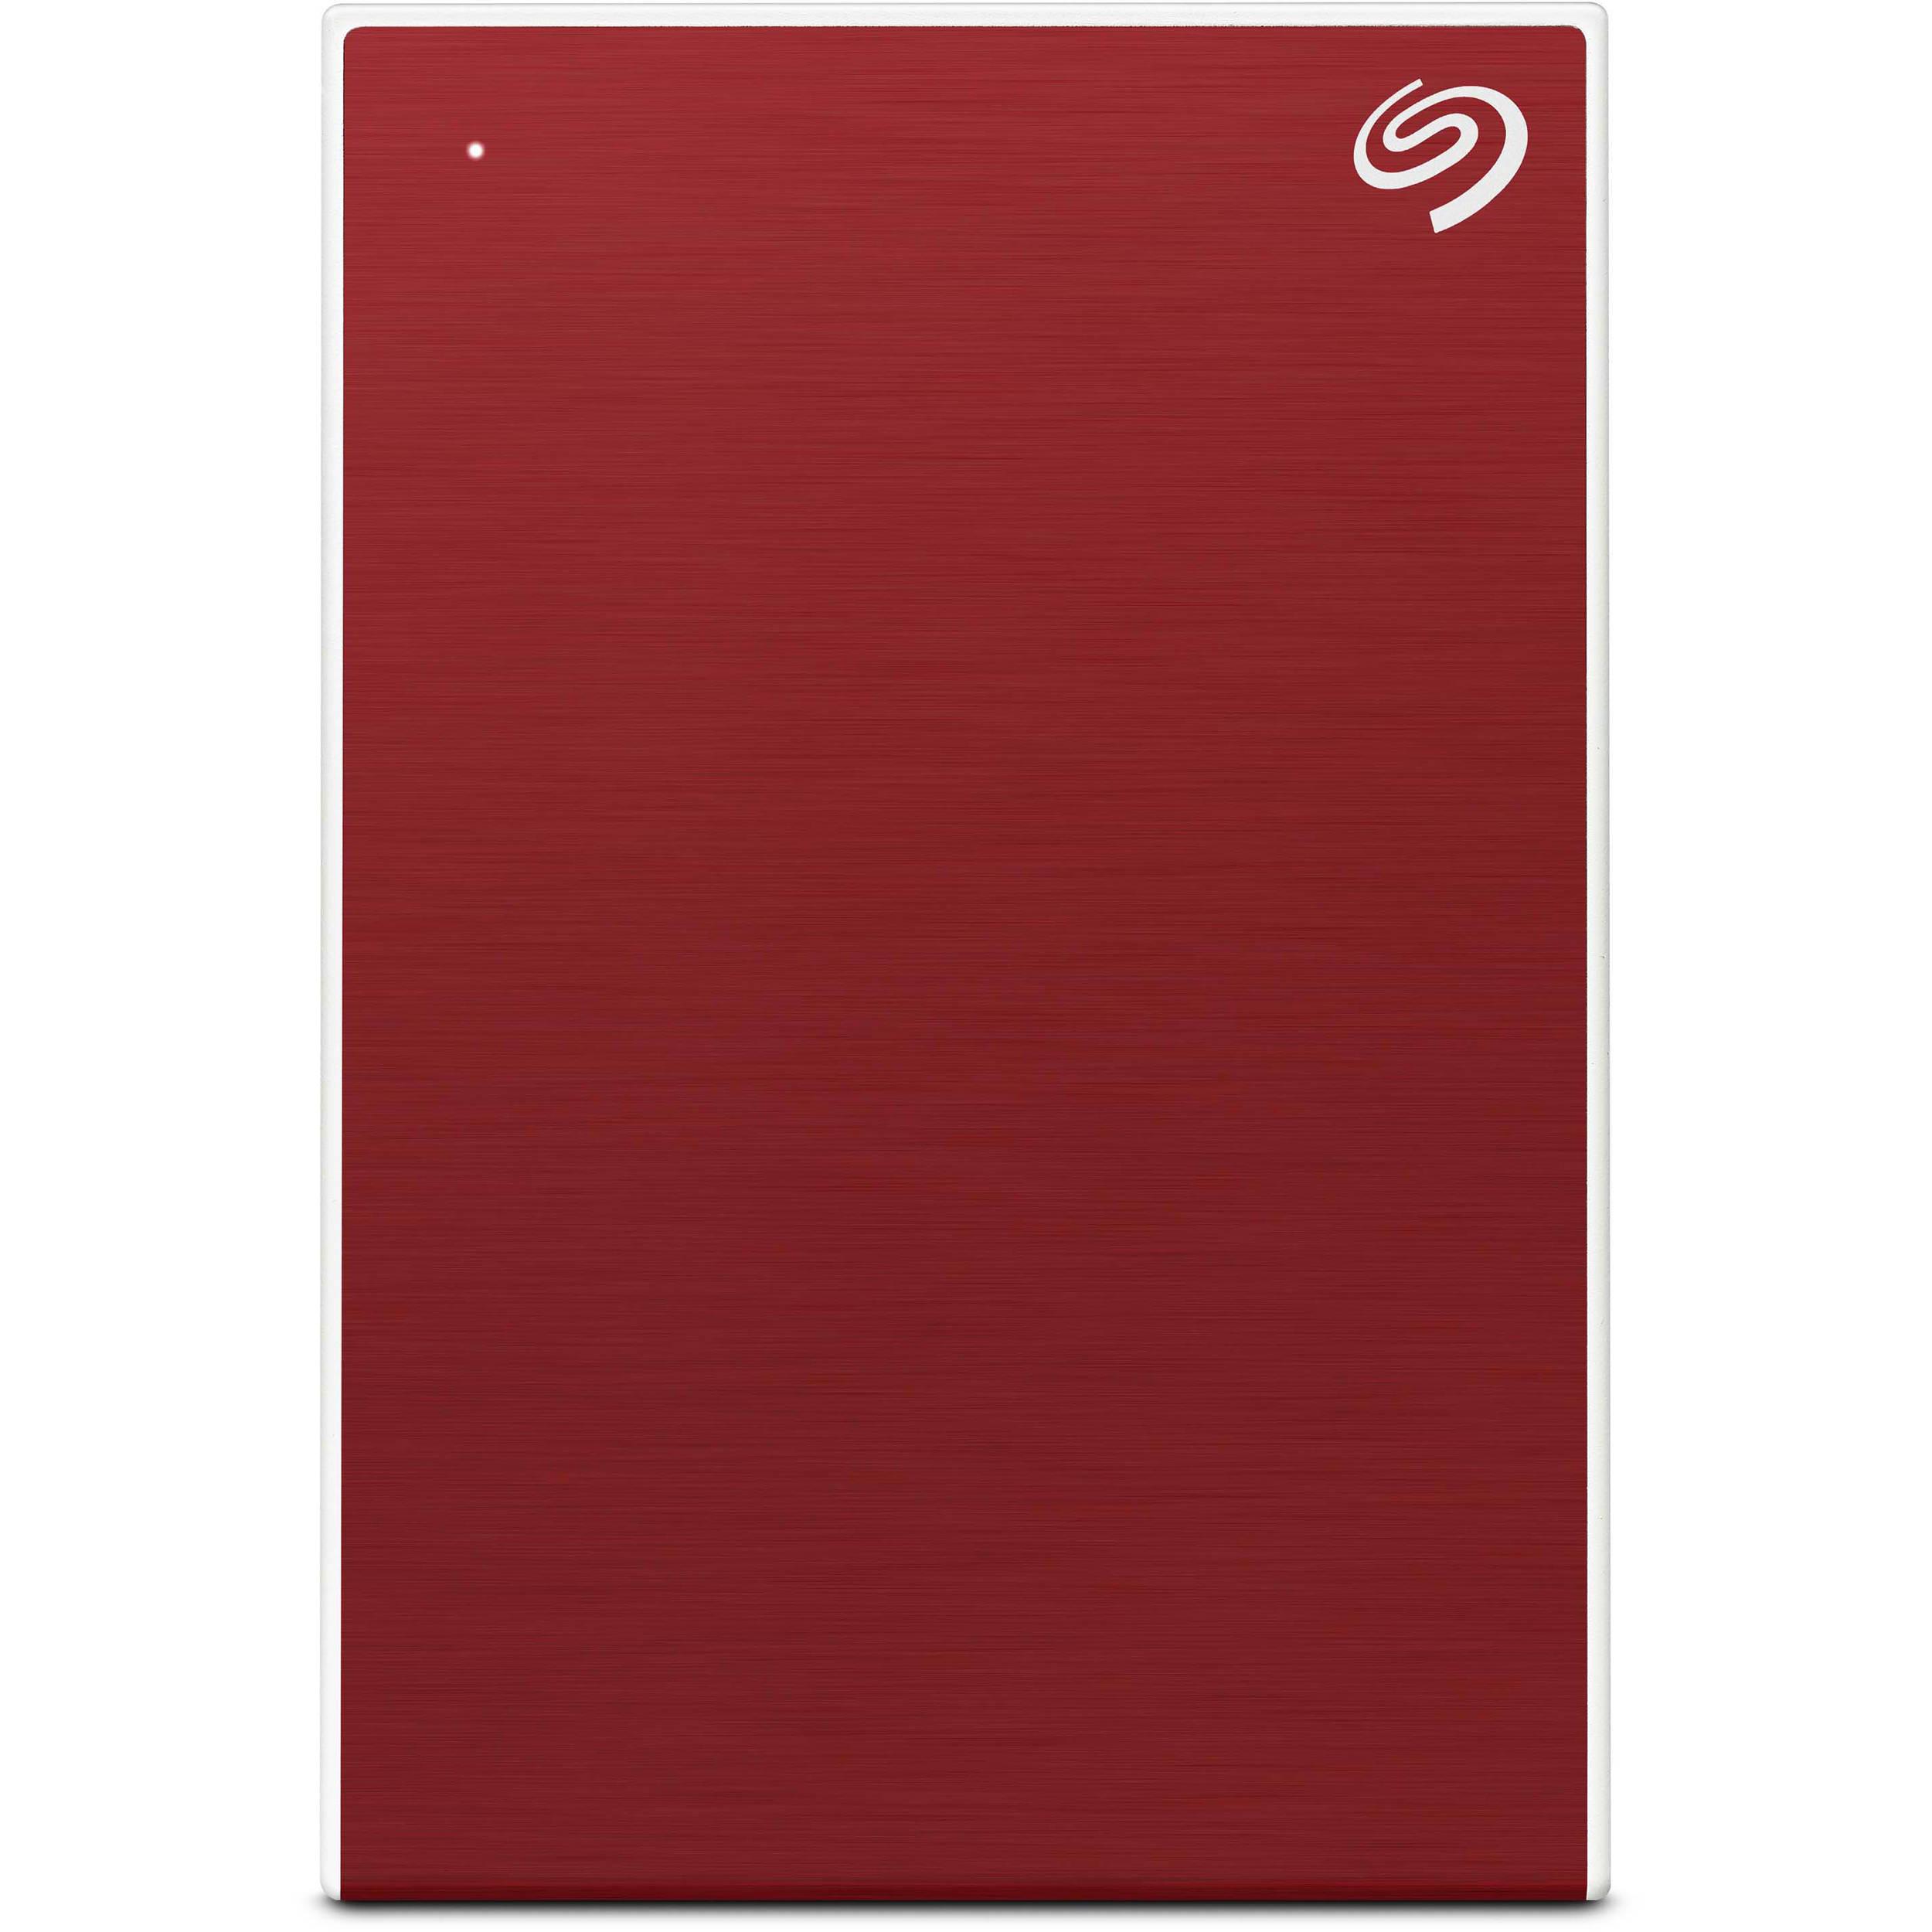 Seagate 1TB Backup Plus Slim USB 3.0 External Hard STHN1000403